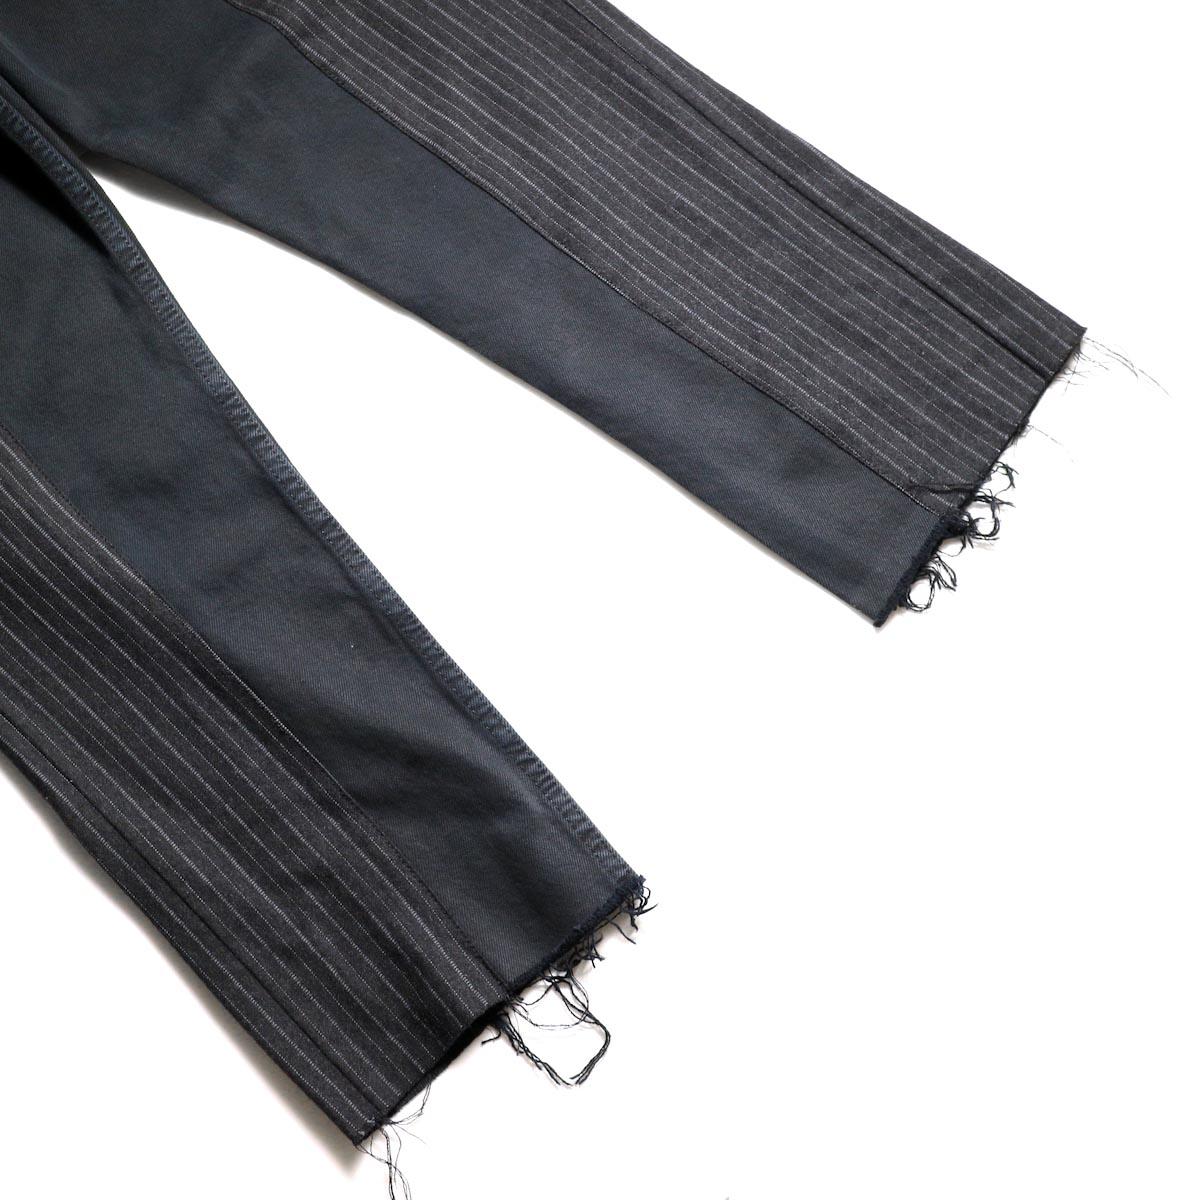 OLD PARK / Docking Jeans Black (Ssize-A)裾